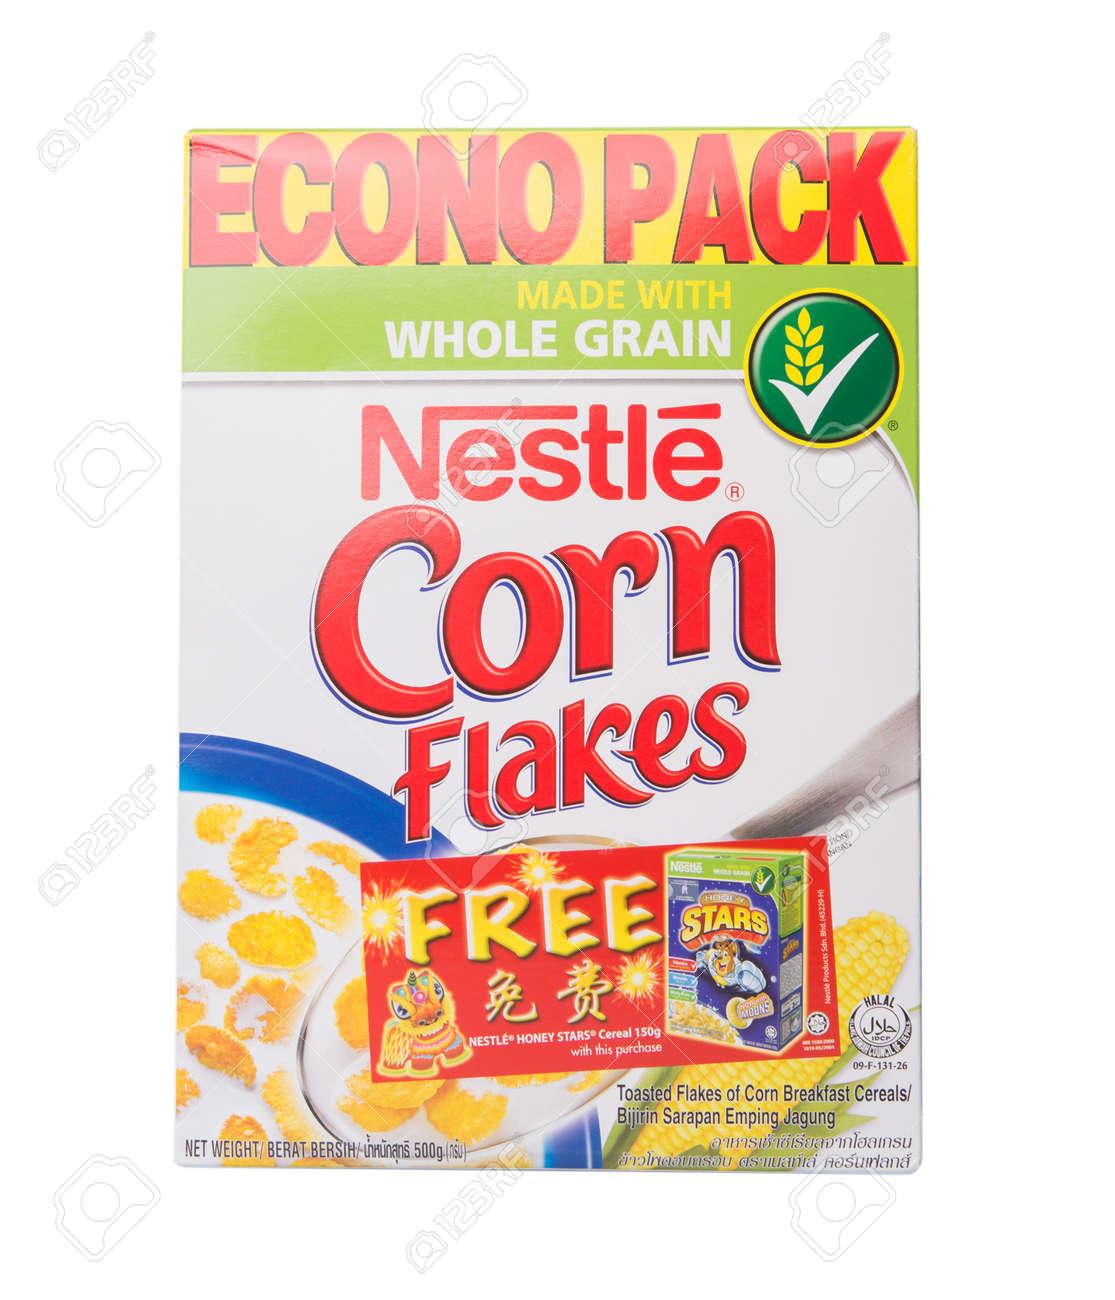 KUALA LUMPUR, MALAYSIA - FEBRUARY 24TH 2015  Nestle Corn breakfast